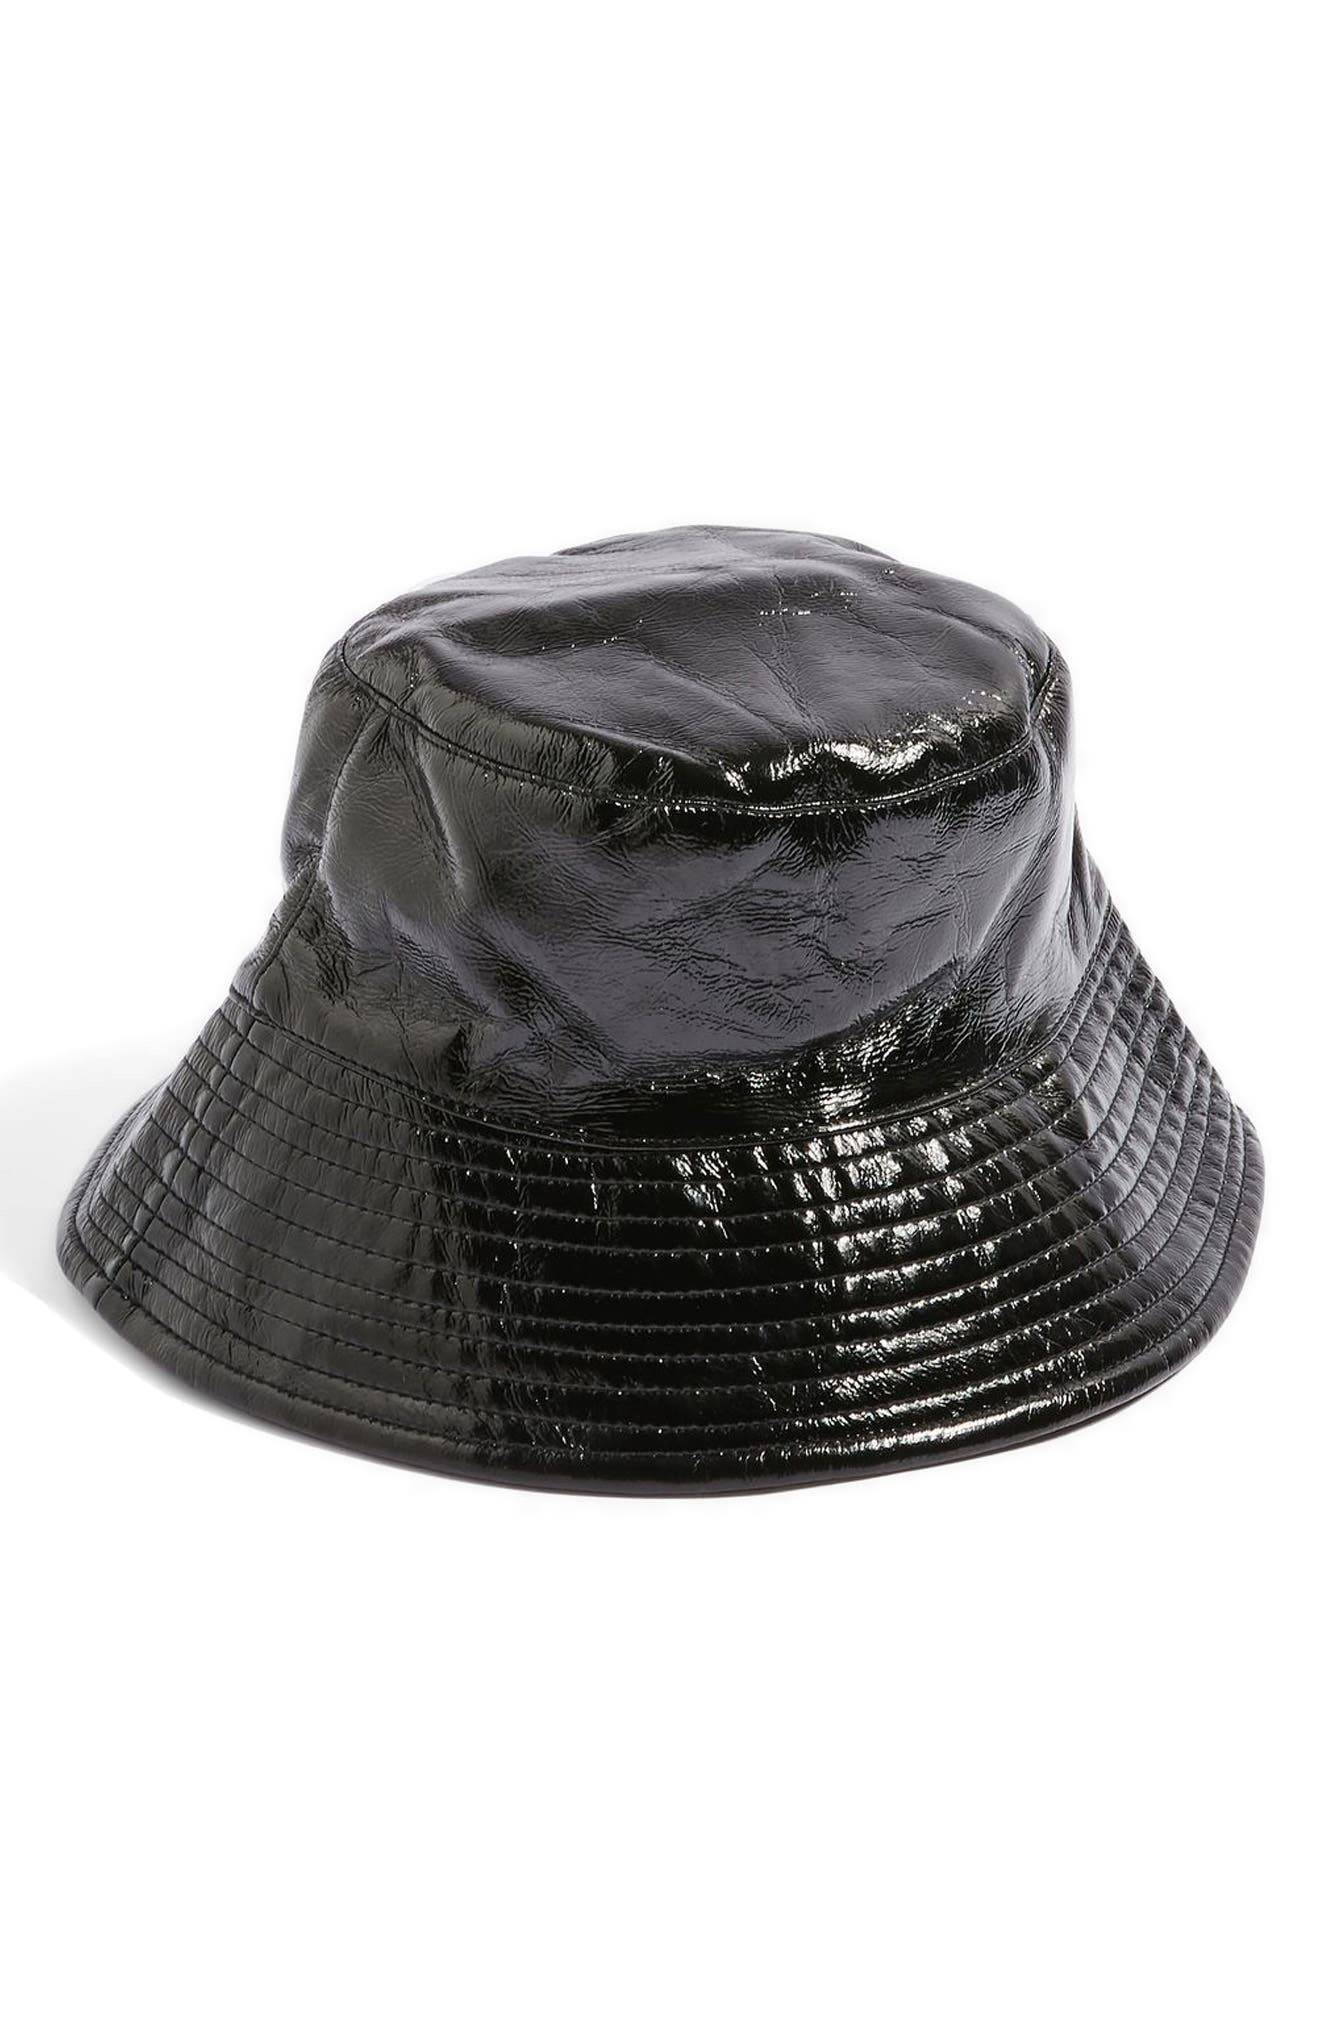 Vinyl Bucket Hat,                             Main thumbnail 1, color,                             Black